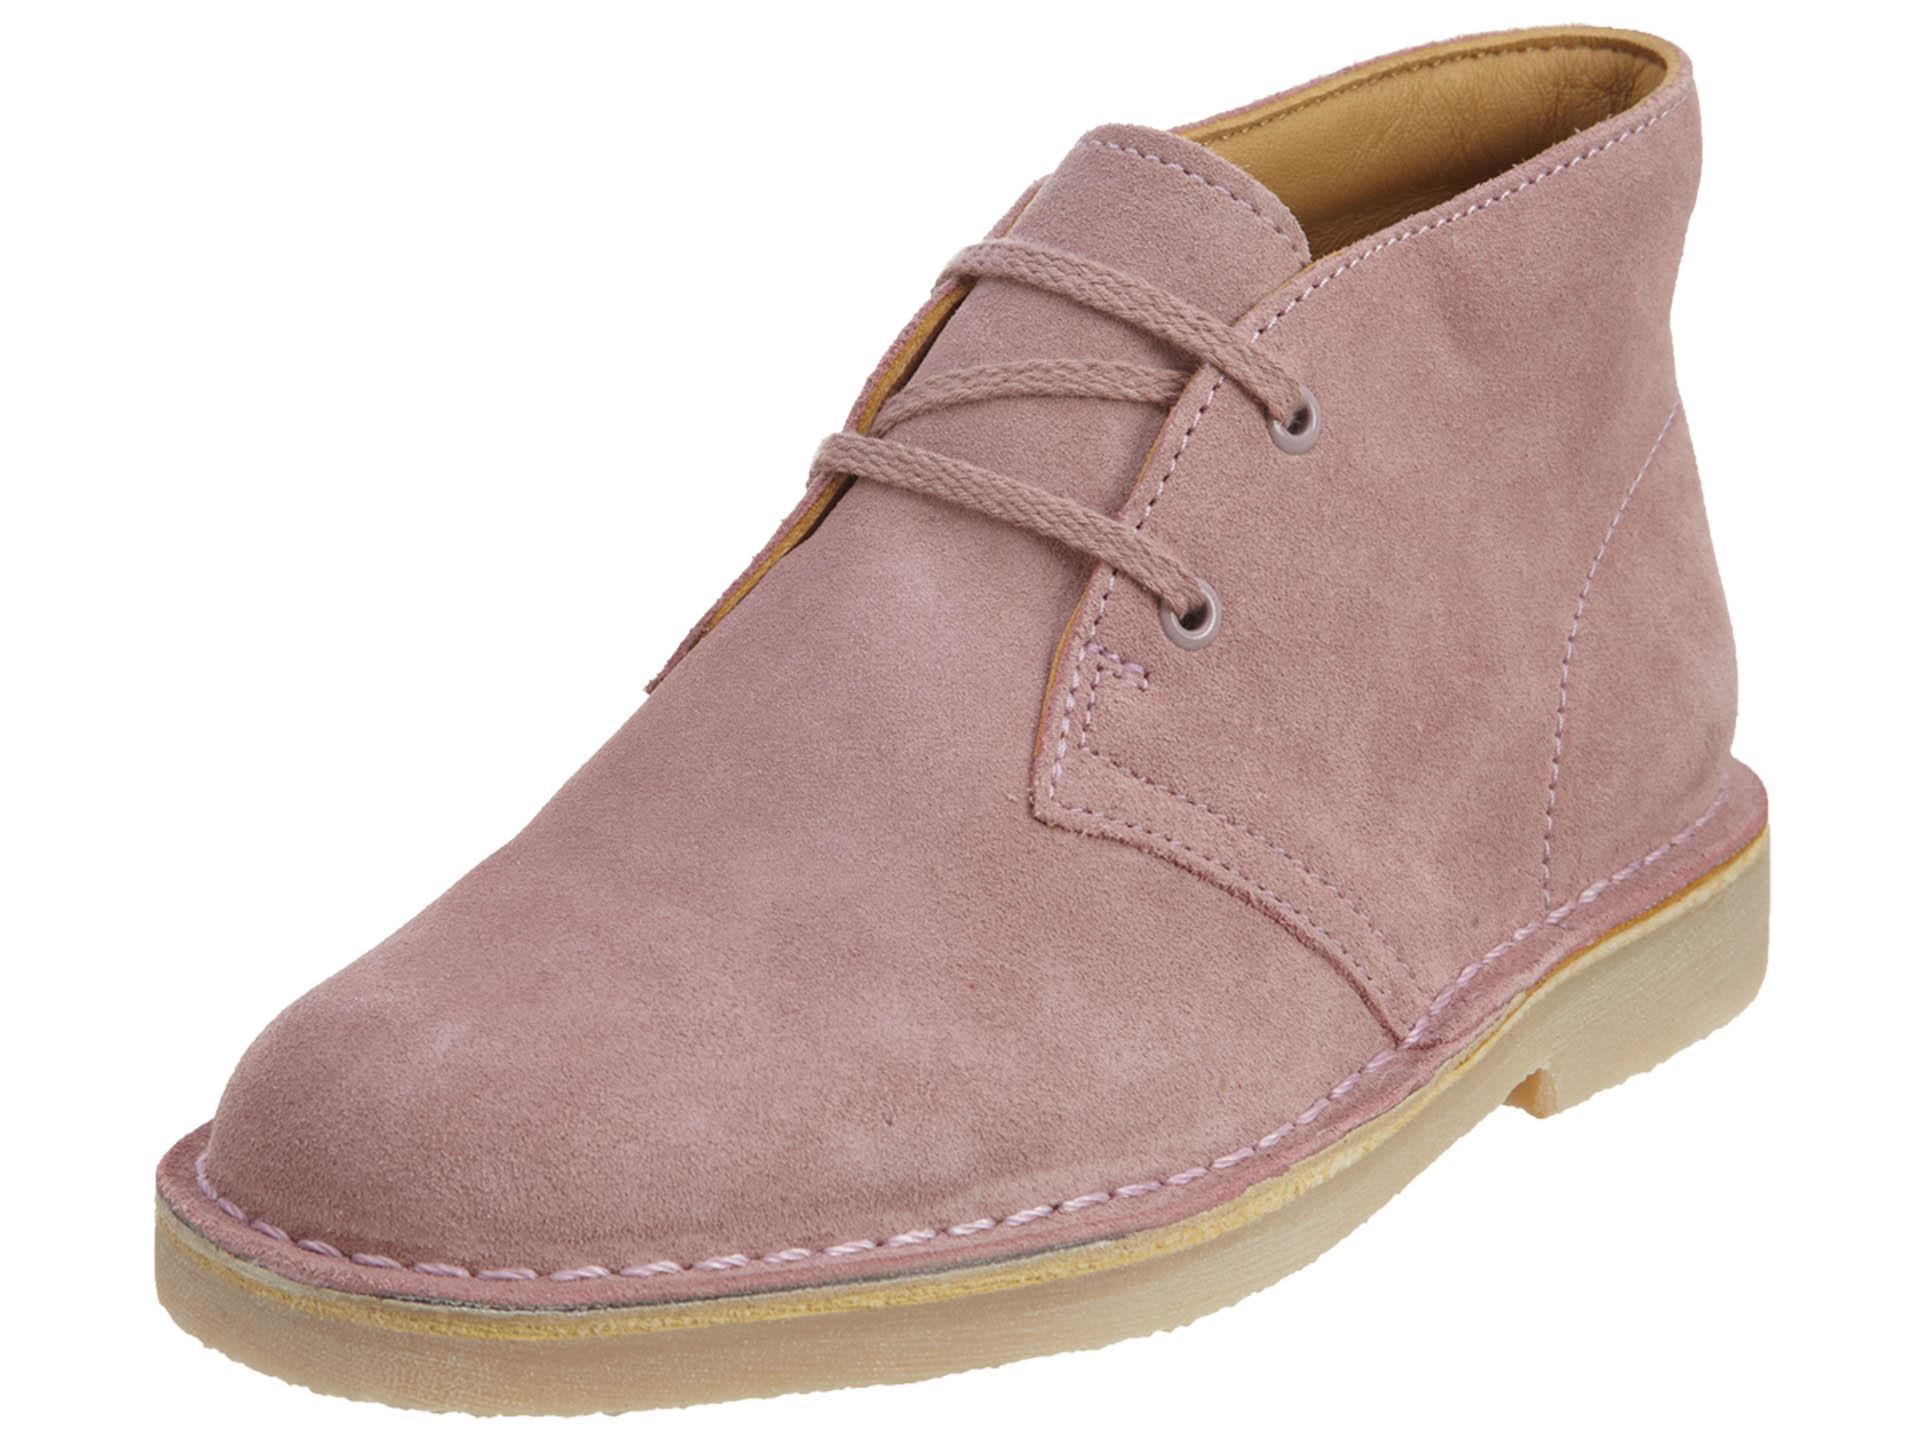 Girls Junior Clarks Rabbit Design Slippers Pretty Toes